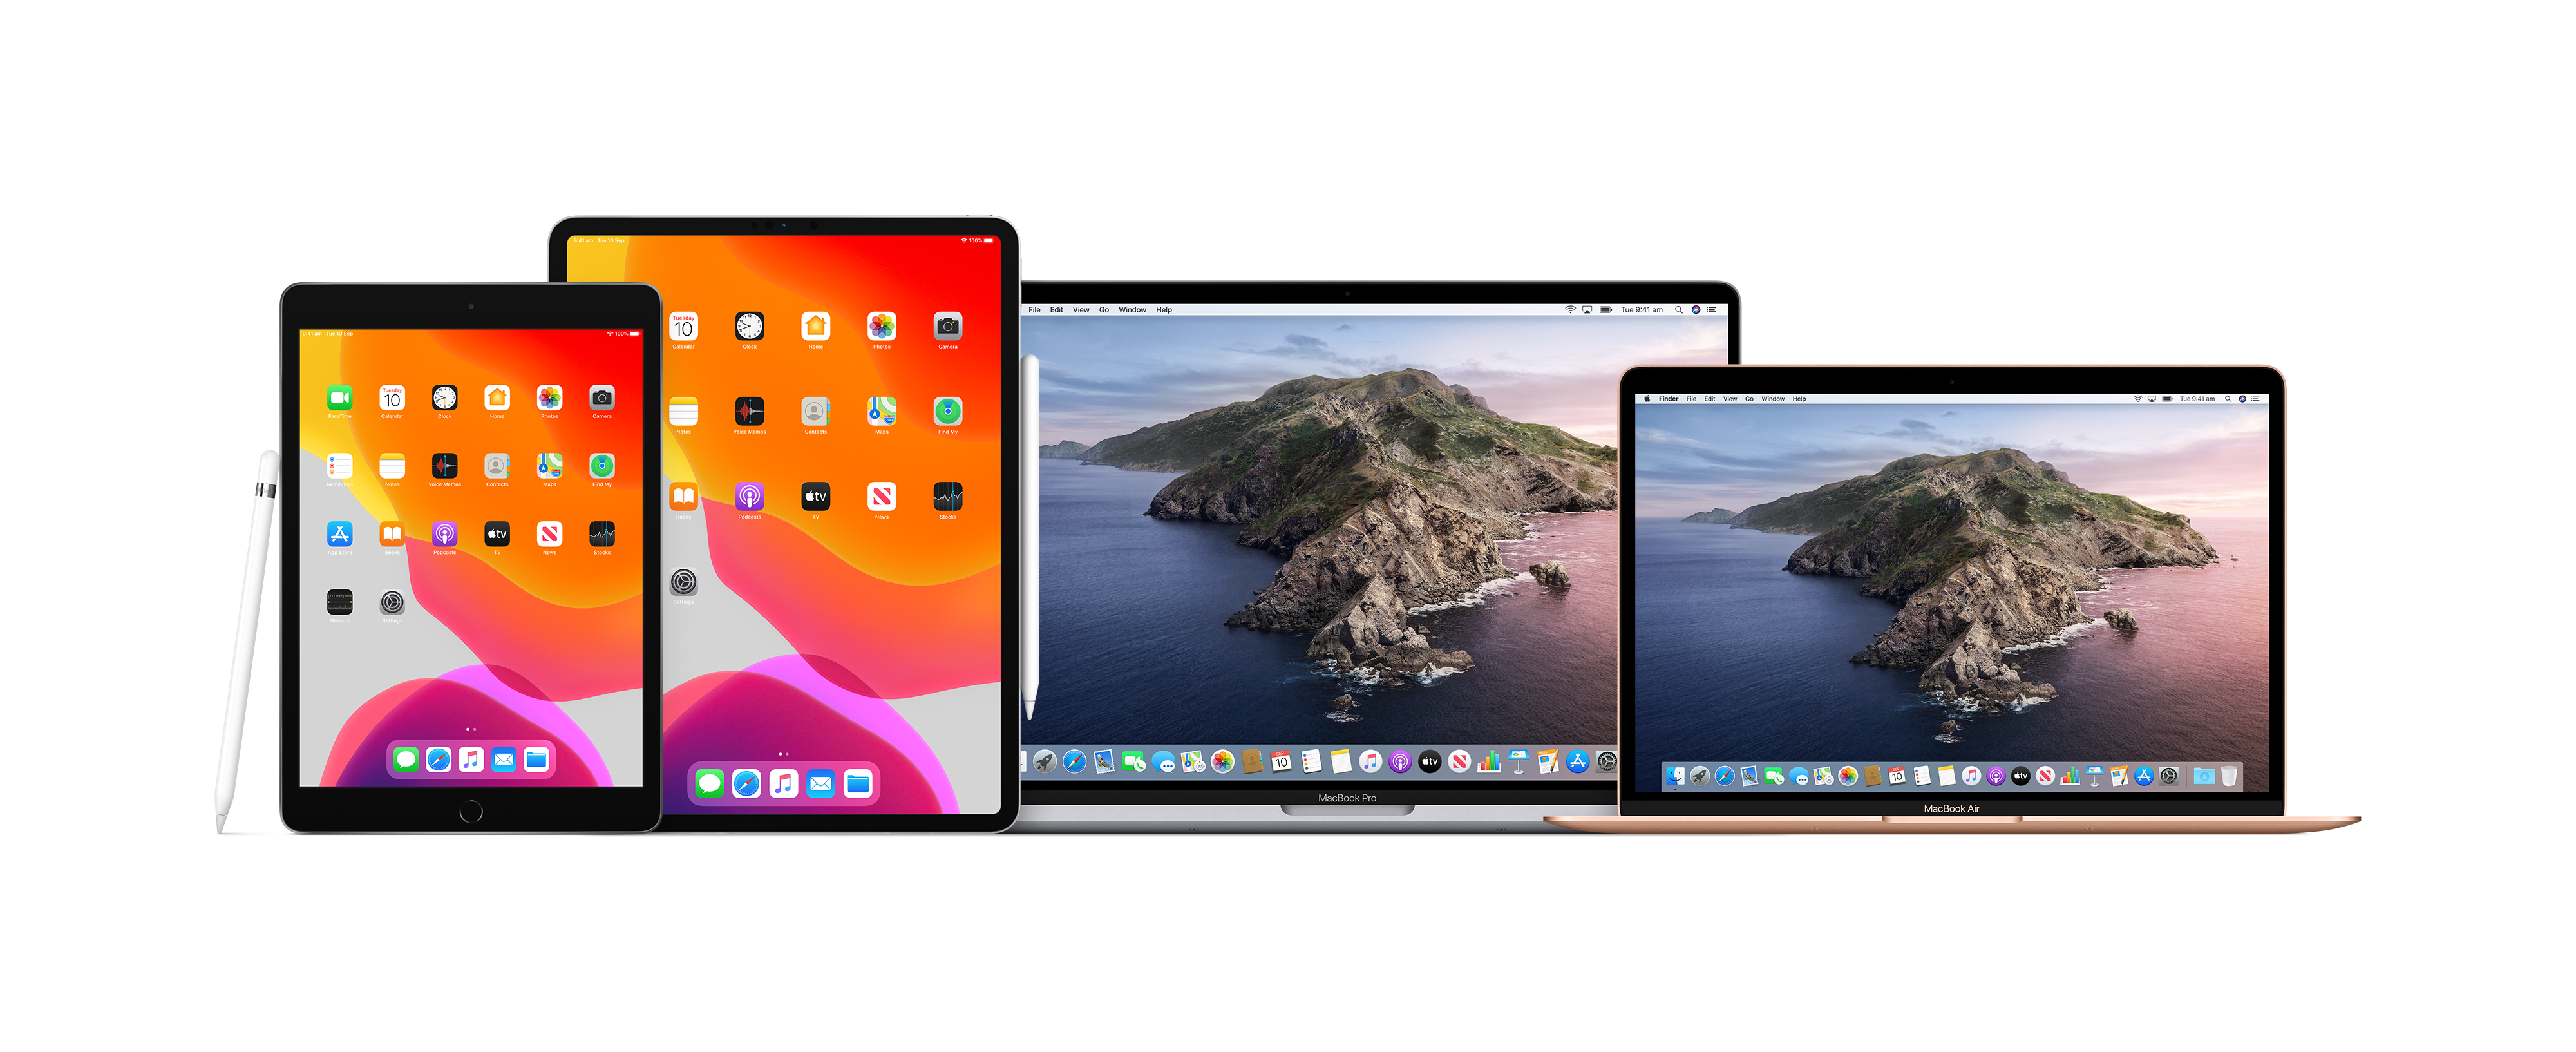 multi-product-ipad-ipad-pro-12-9-in-apple-pencil-macbook-pro-16-in-macbook-air-au-en-screen.png